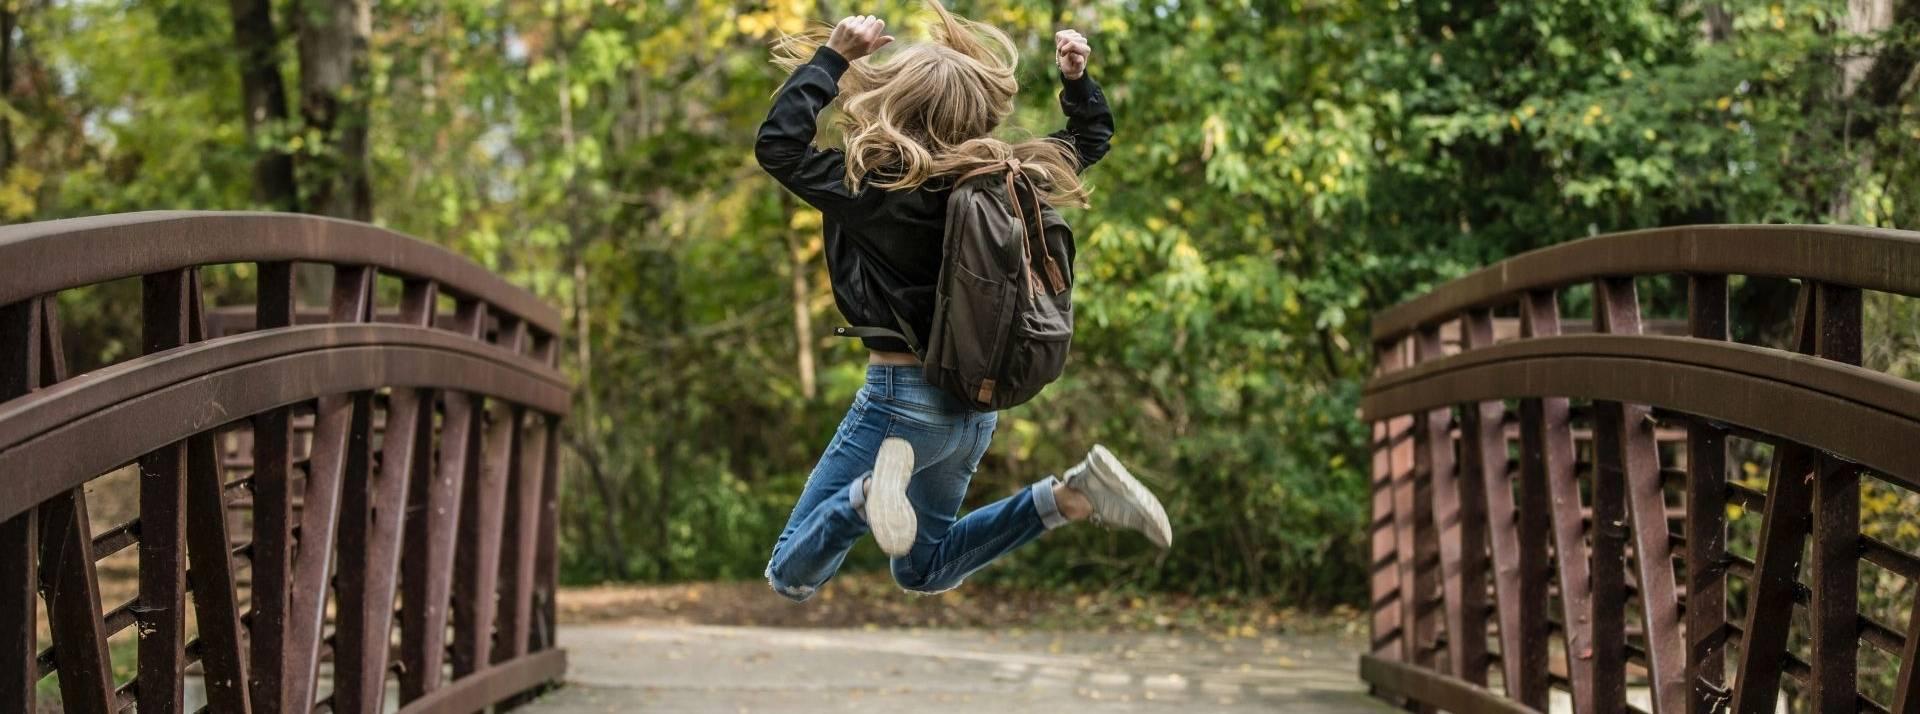 Jeune fille de dos sautantde joie